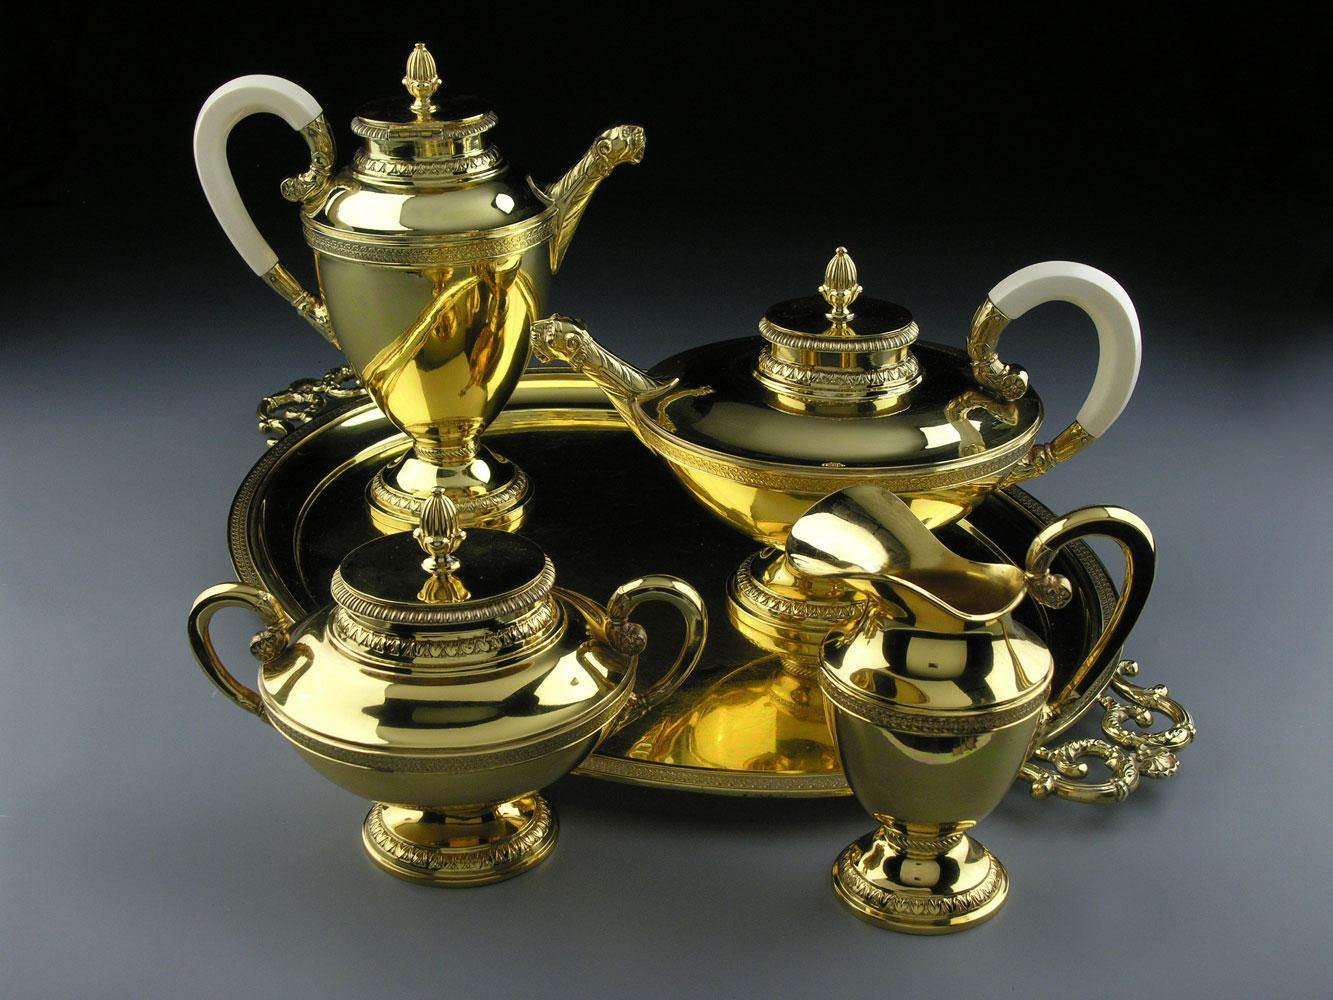 Vergoldetes Kaffee- und Teeservice